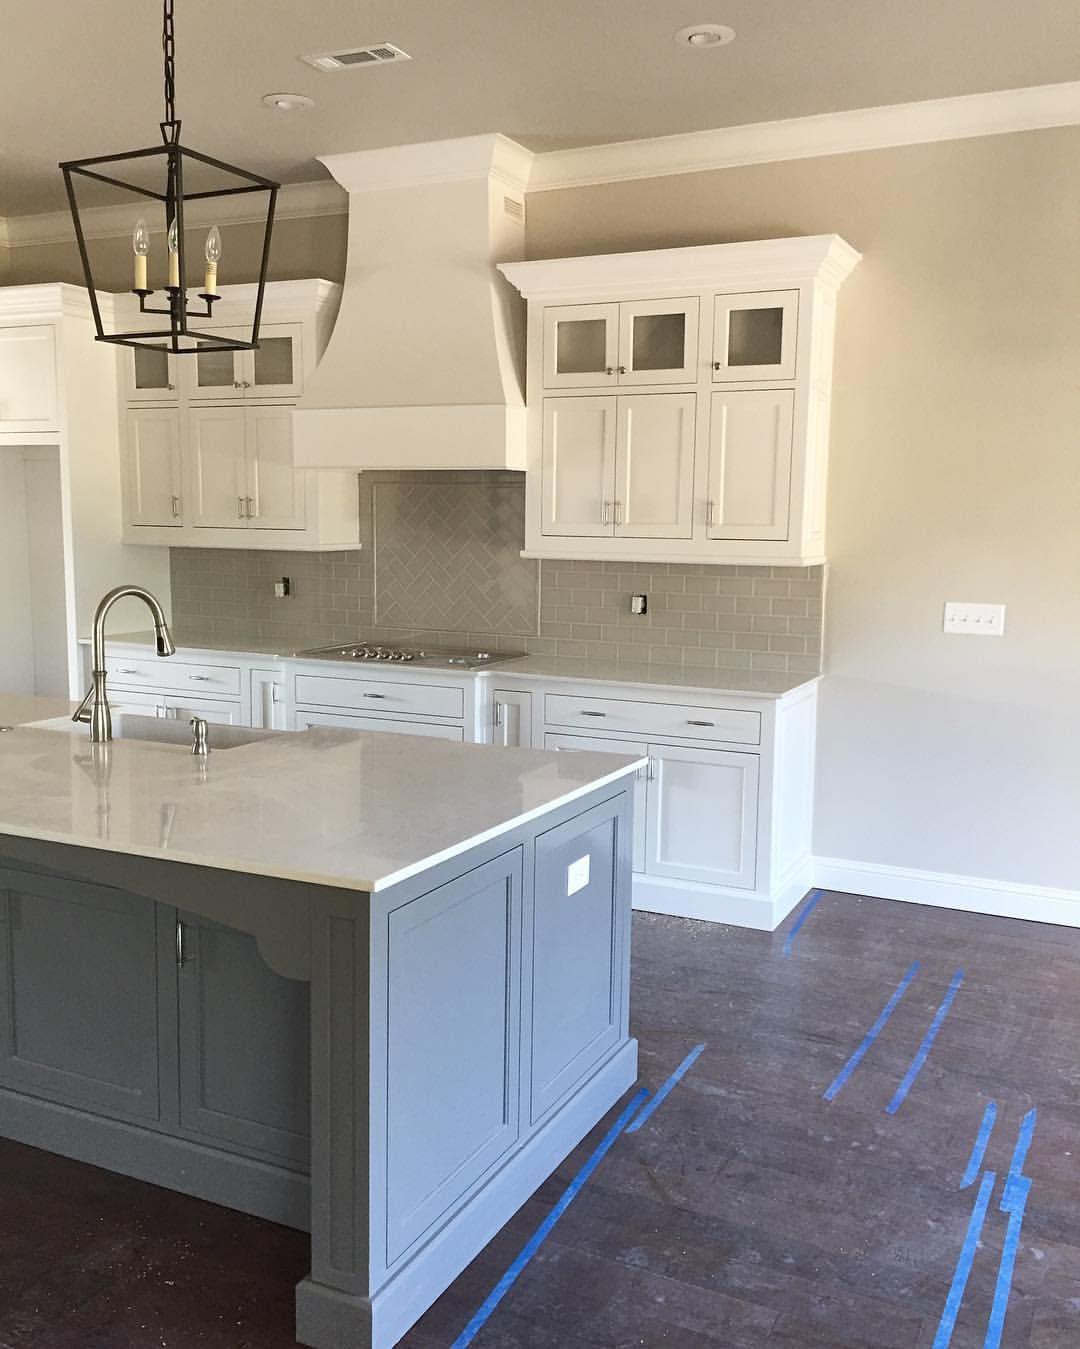 island gauntlet gray grey painted kitchen grey blue kitchen farmhouse kitchen cabinets on farmhouse kitchen grey cabinets id=44593